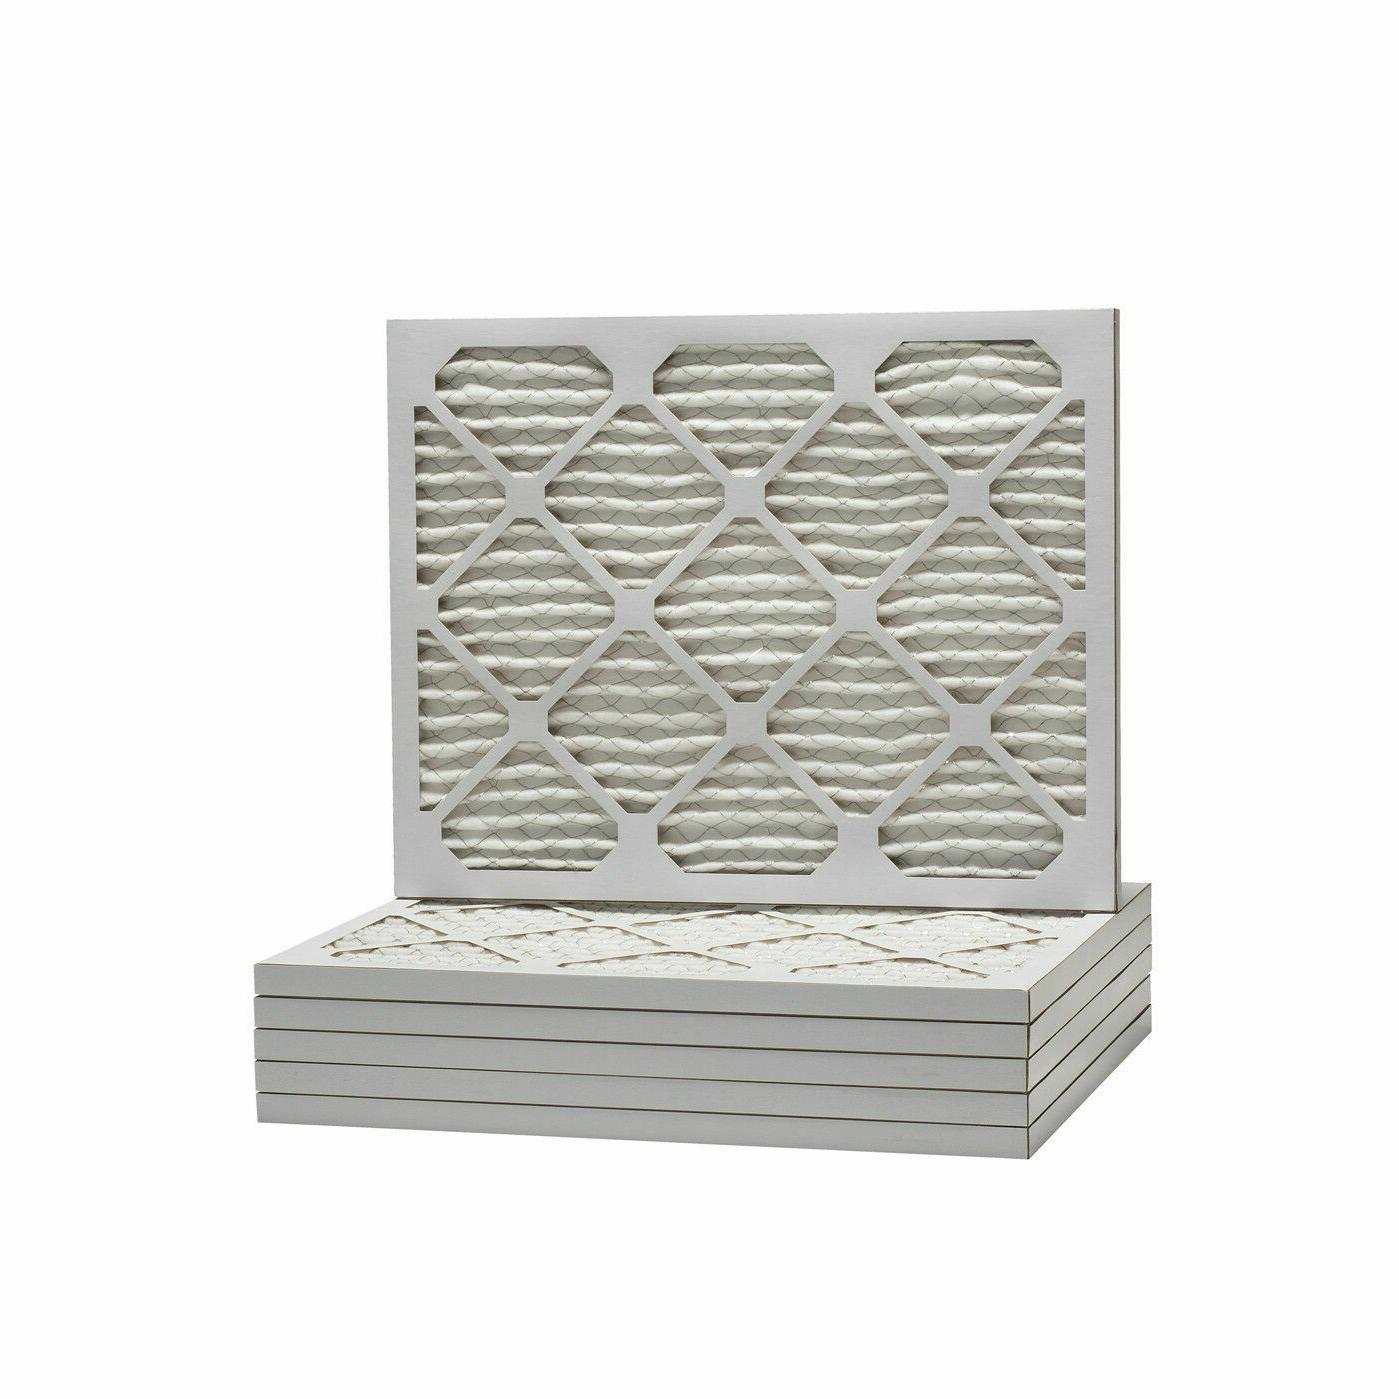 16x20x1 ultimate allergen merv 13 replacement furnace